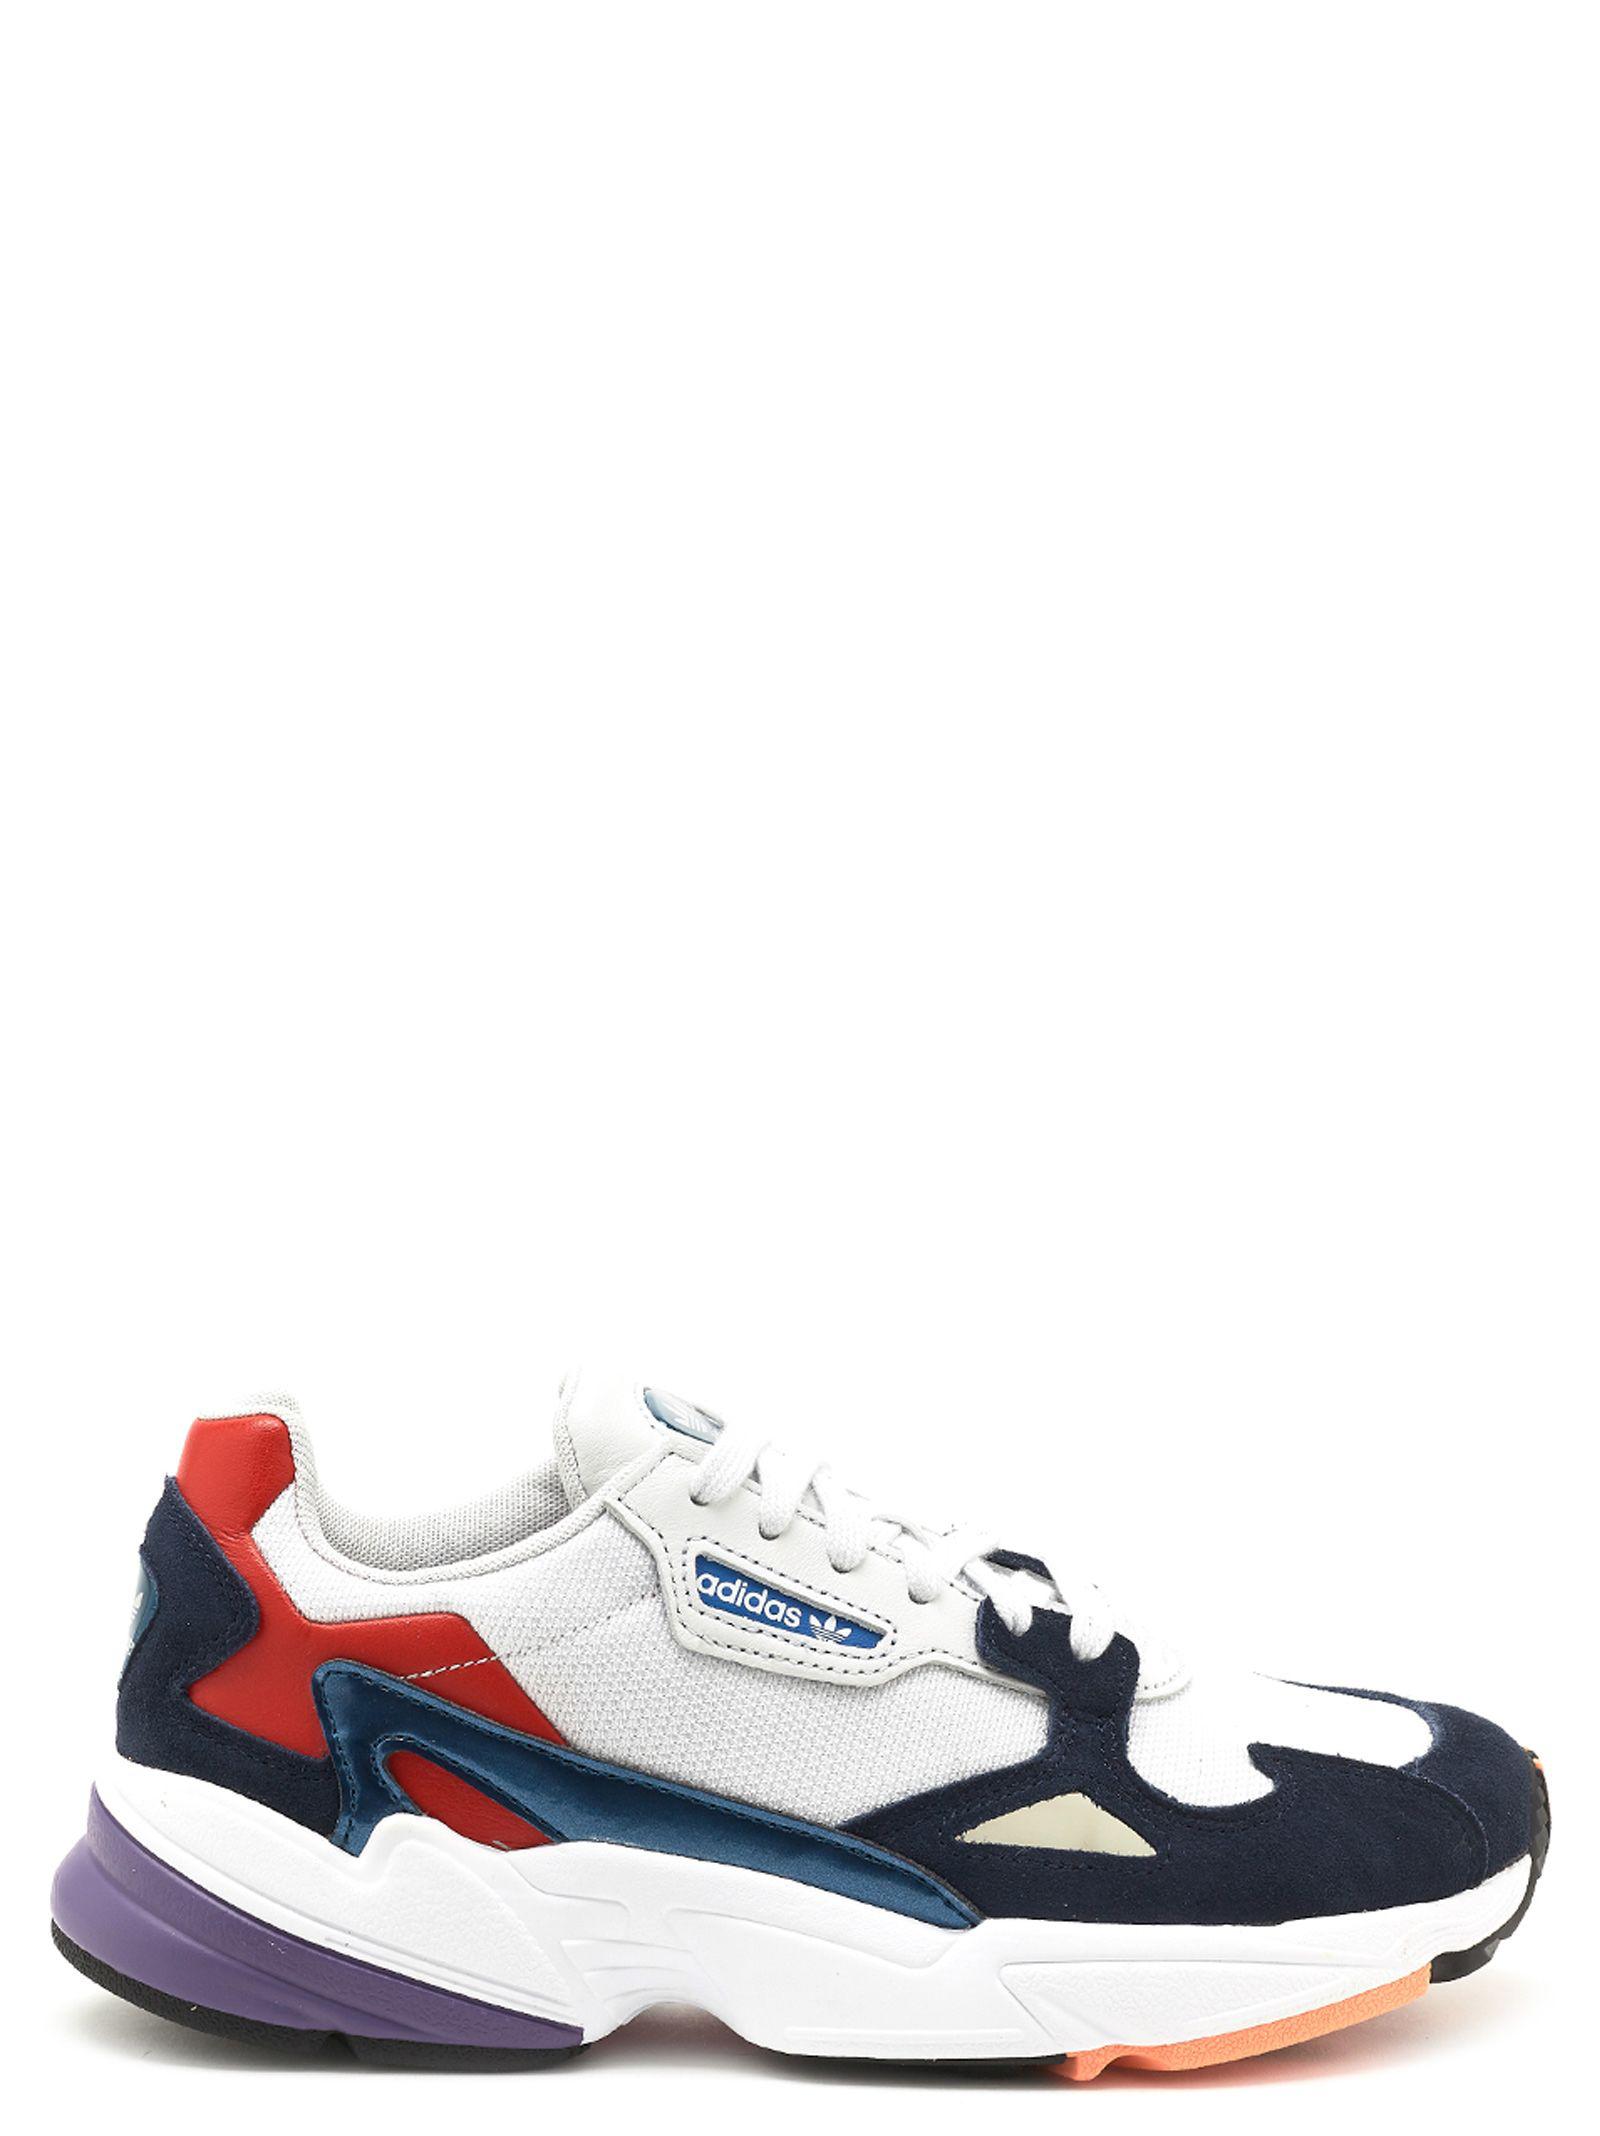 sale retailer 417a5 dc9fd Adidas Originals Women s Originals Falcon Casual Shoes, White In Crystal  White S16